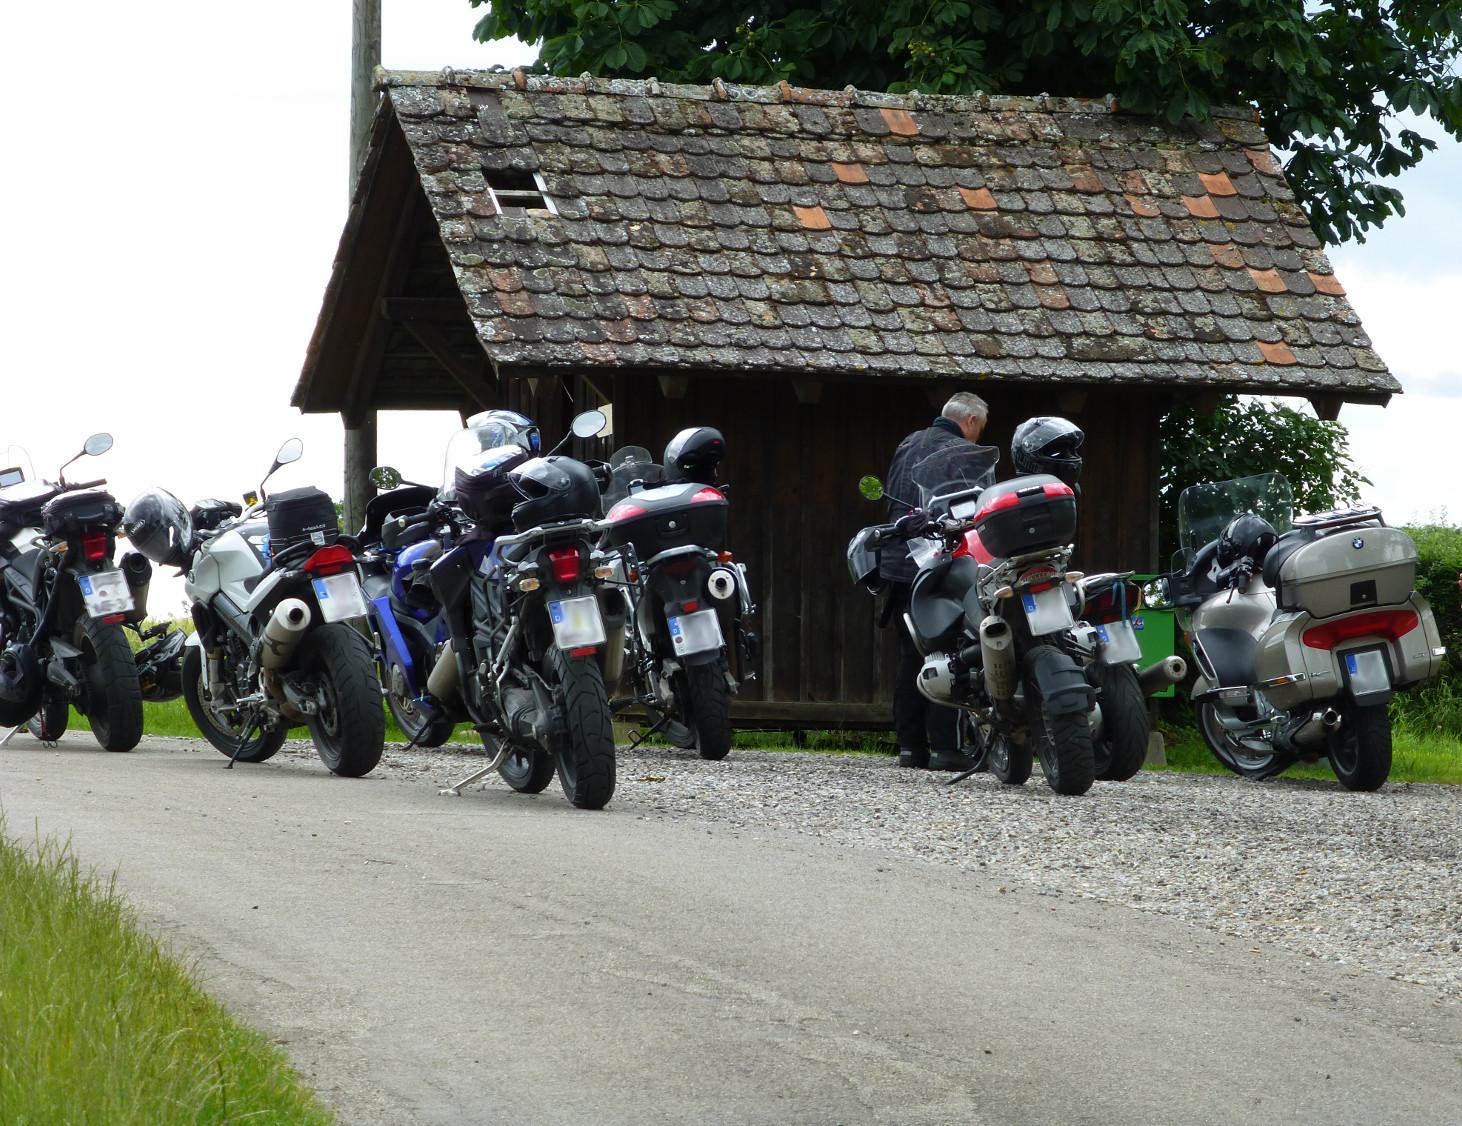 Biker Geschenke  Biker Geschenke Reisen und erleben – Motorradtouren